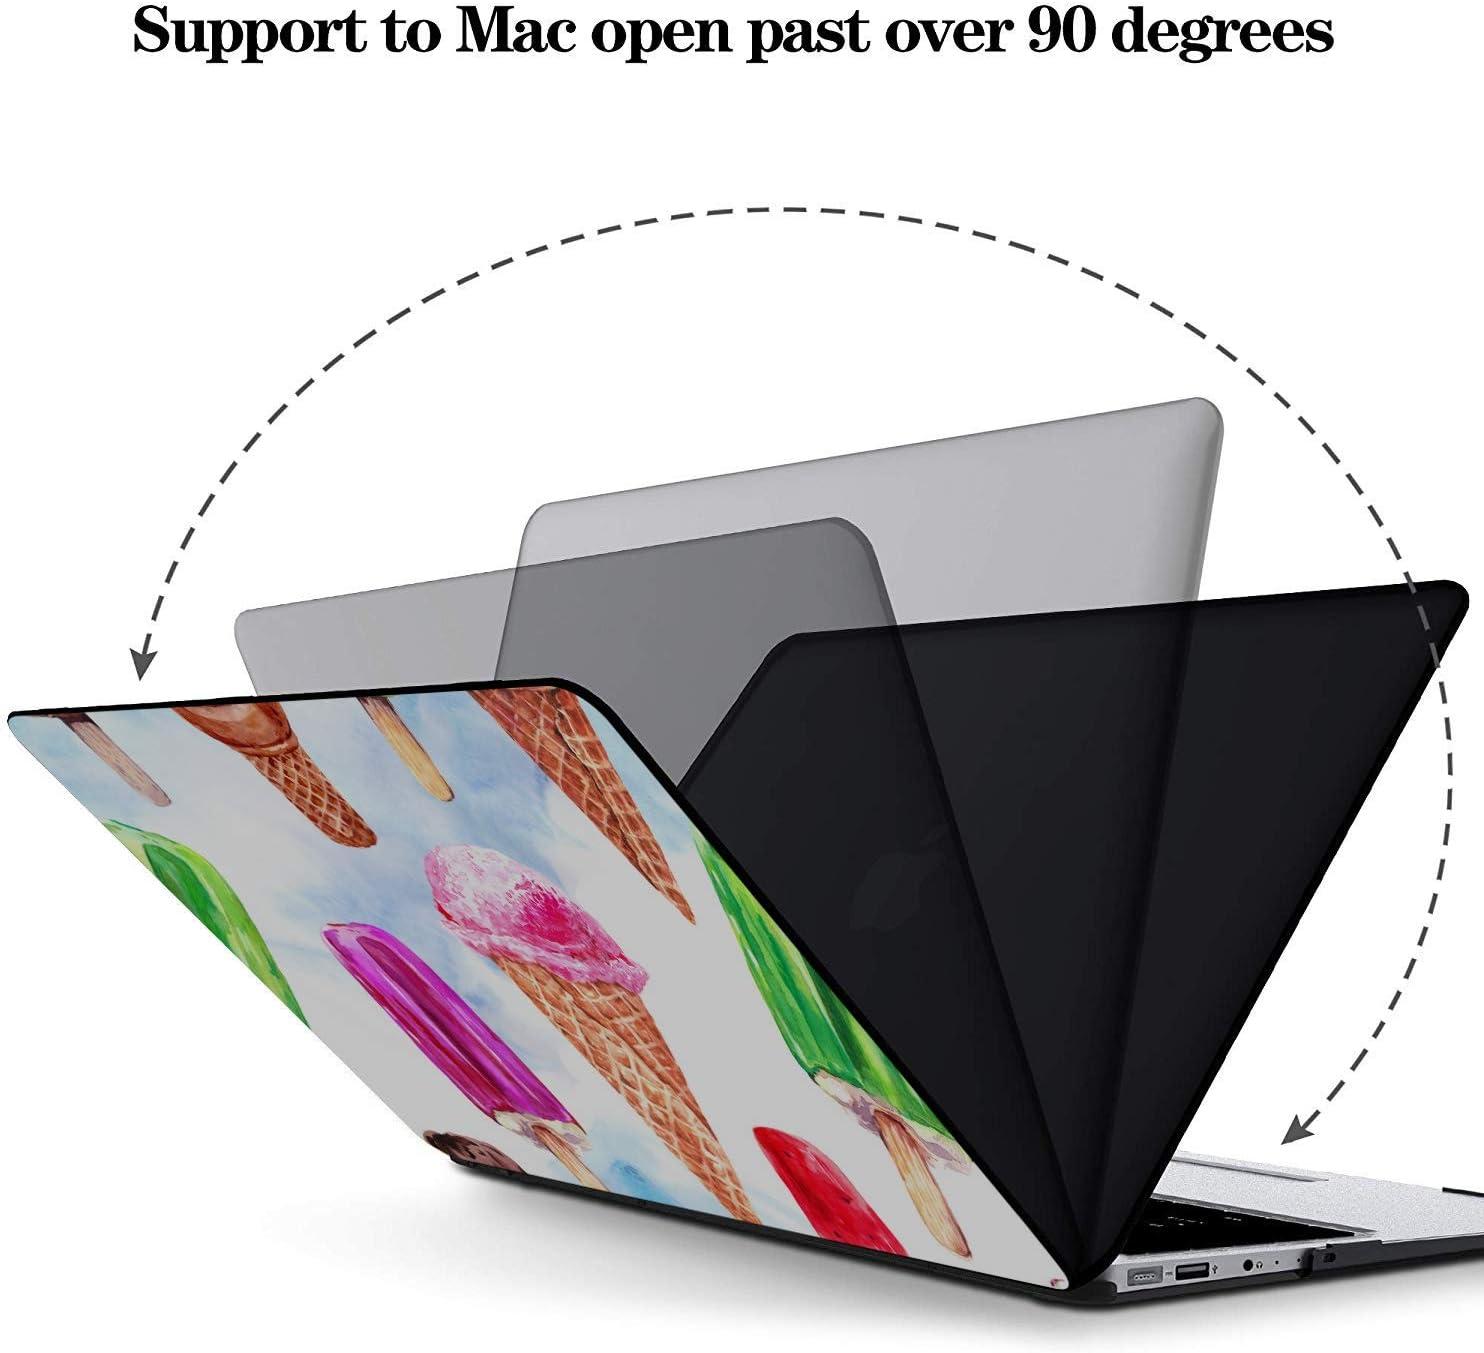 2017 MacBook Pro Case Summer Dessert Pointer Ice Cream Plastic Hard Shell Compatible Mac Air 11 Pro 13 15 MacBook Air Protective Cover Protection for MacBook 2016-2019 Version